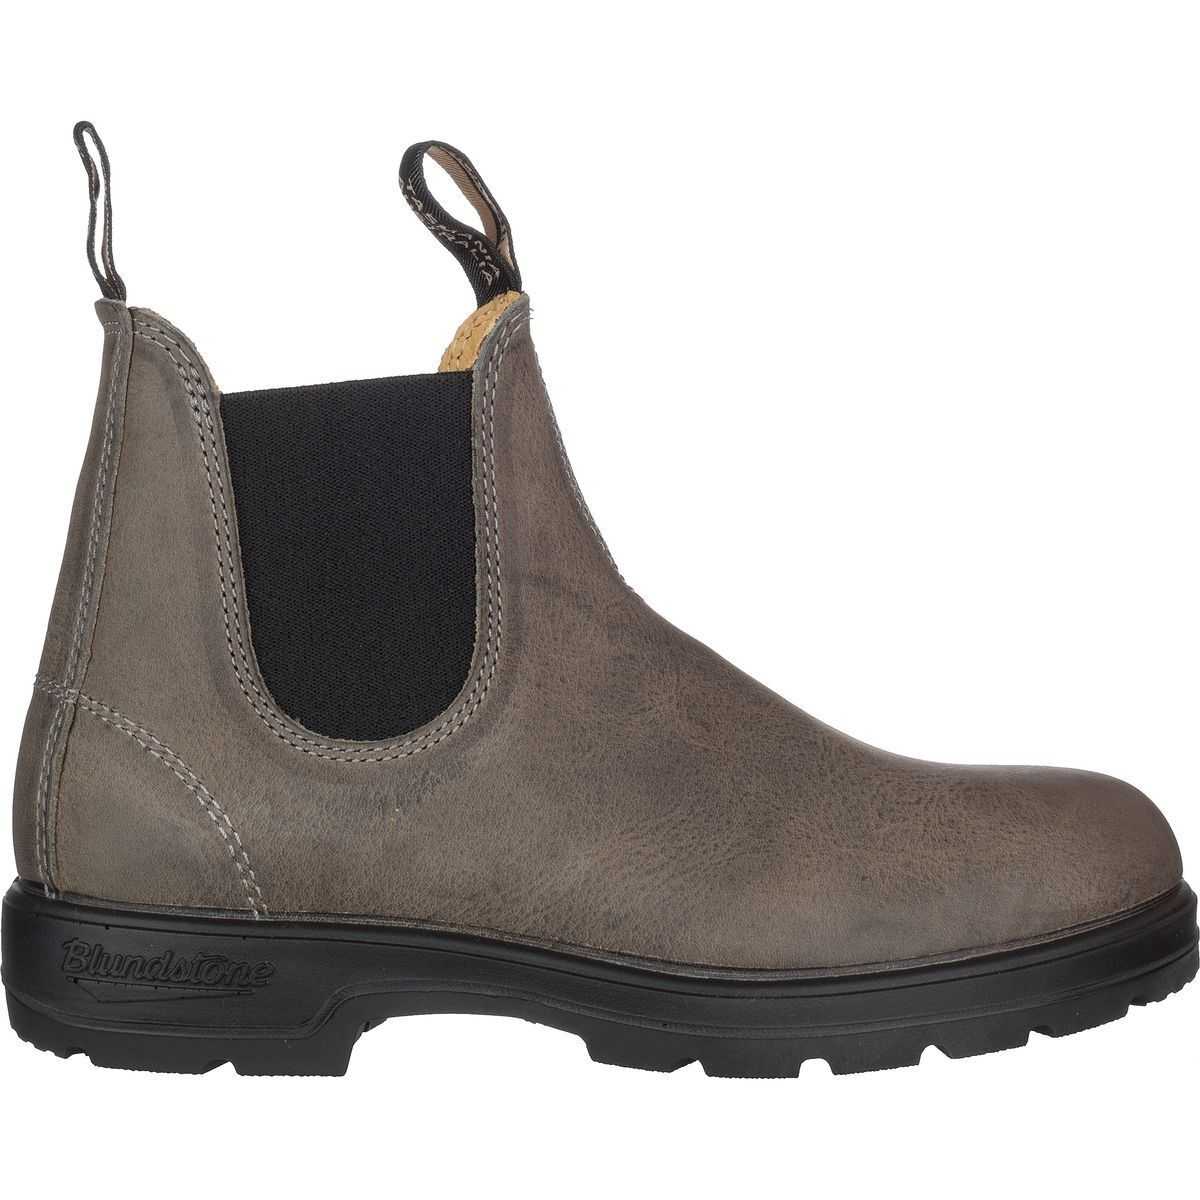 Blundstone-Super-550-Series-Boot-Women-039-s thumbnail 15